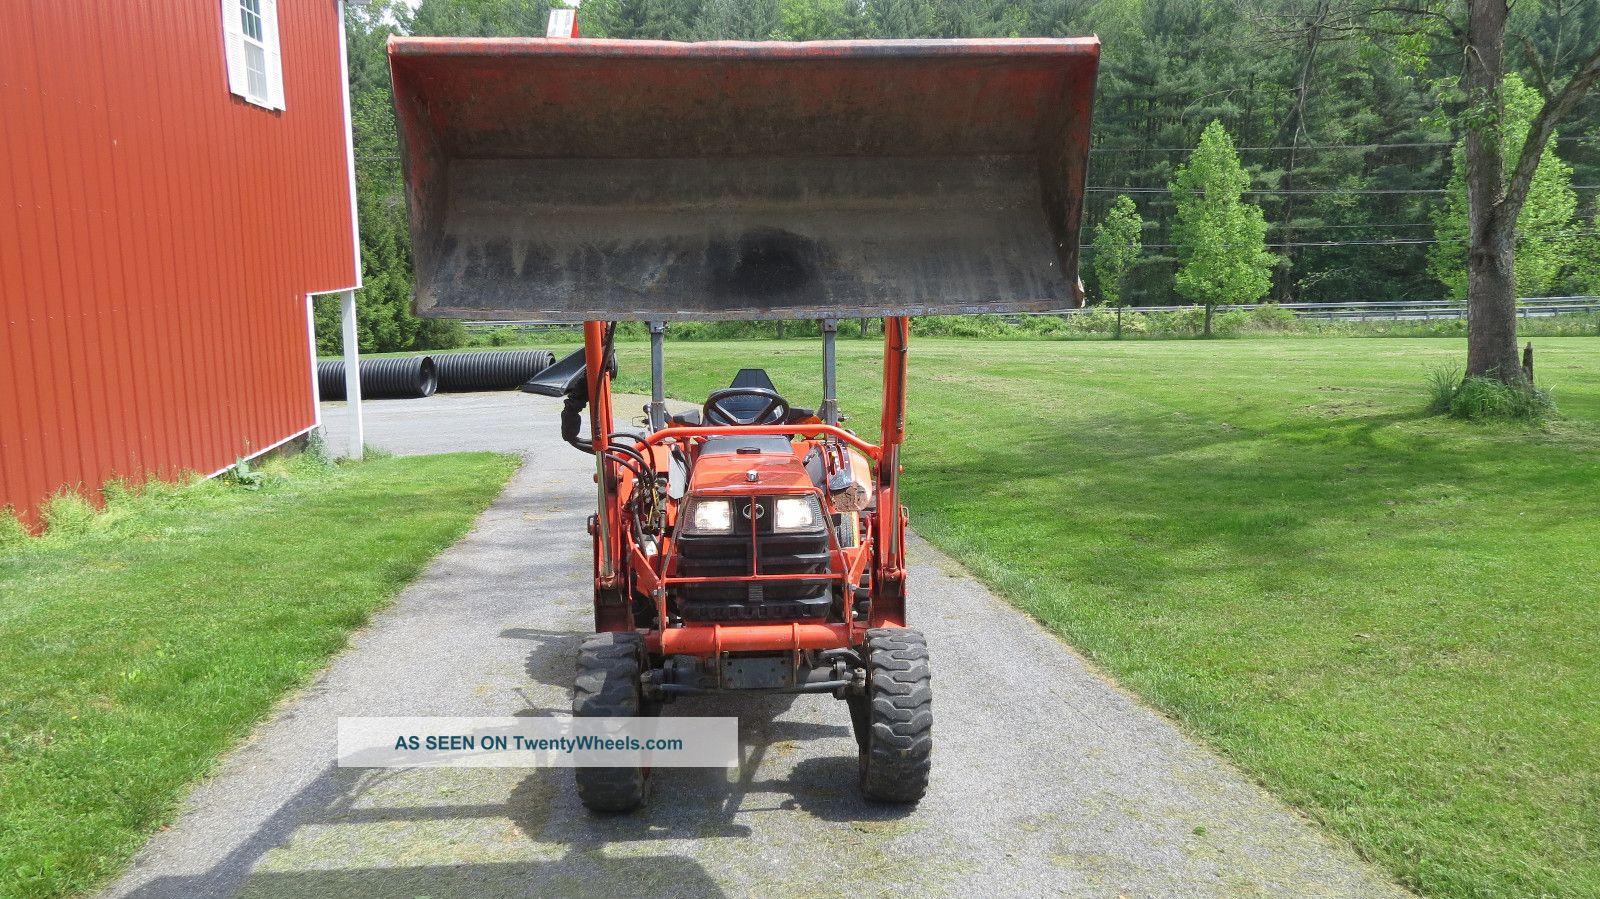 Kubota Tractor Tires R4 : Kubota b hydrostatic compact loader tractor hp